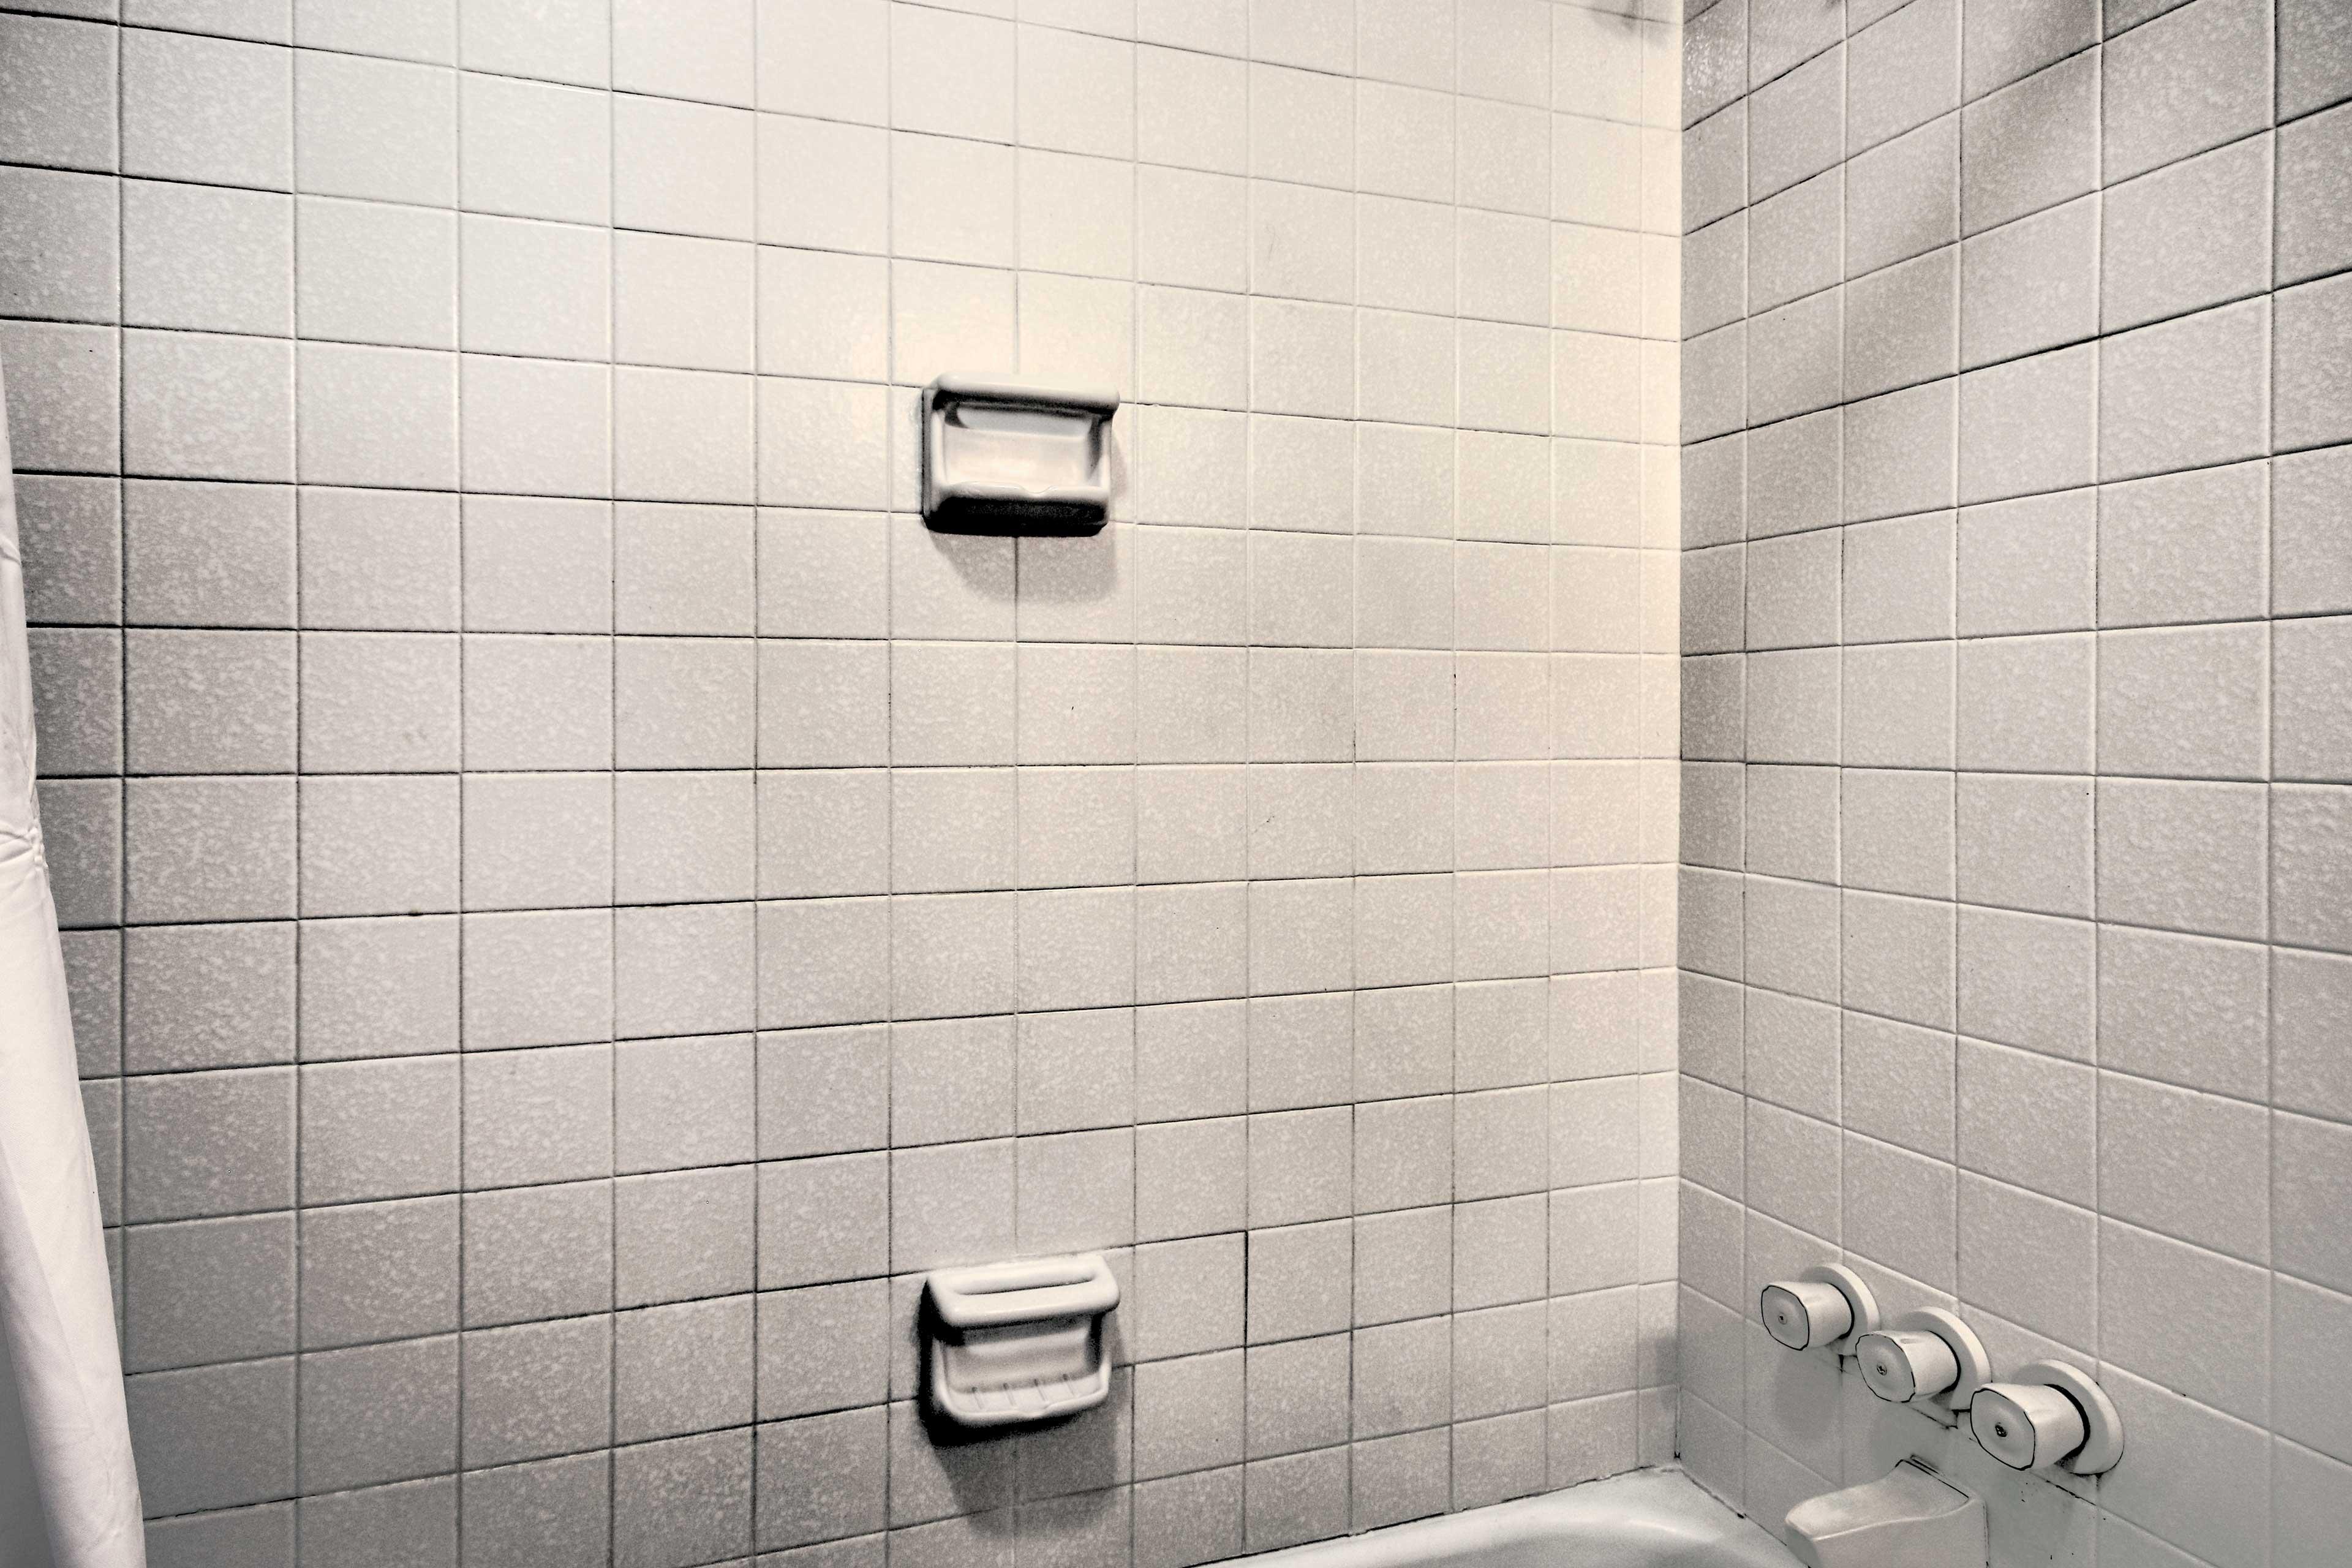 The second en-suite offers a shower/tub combo.